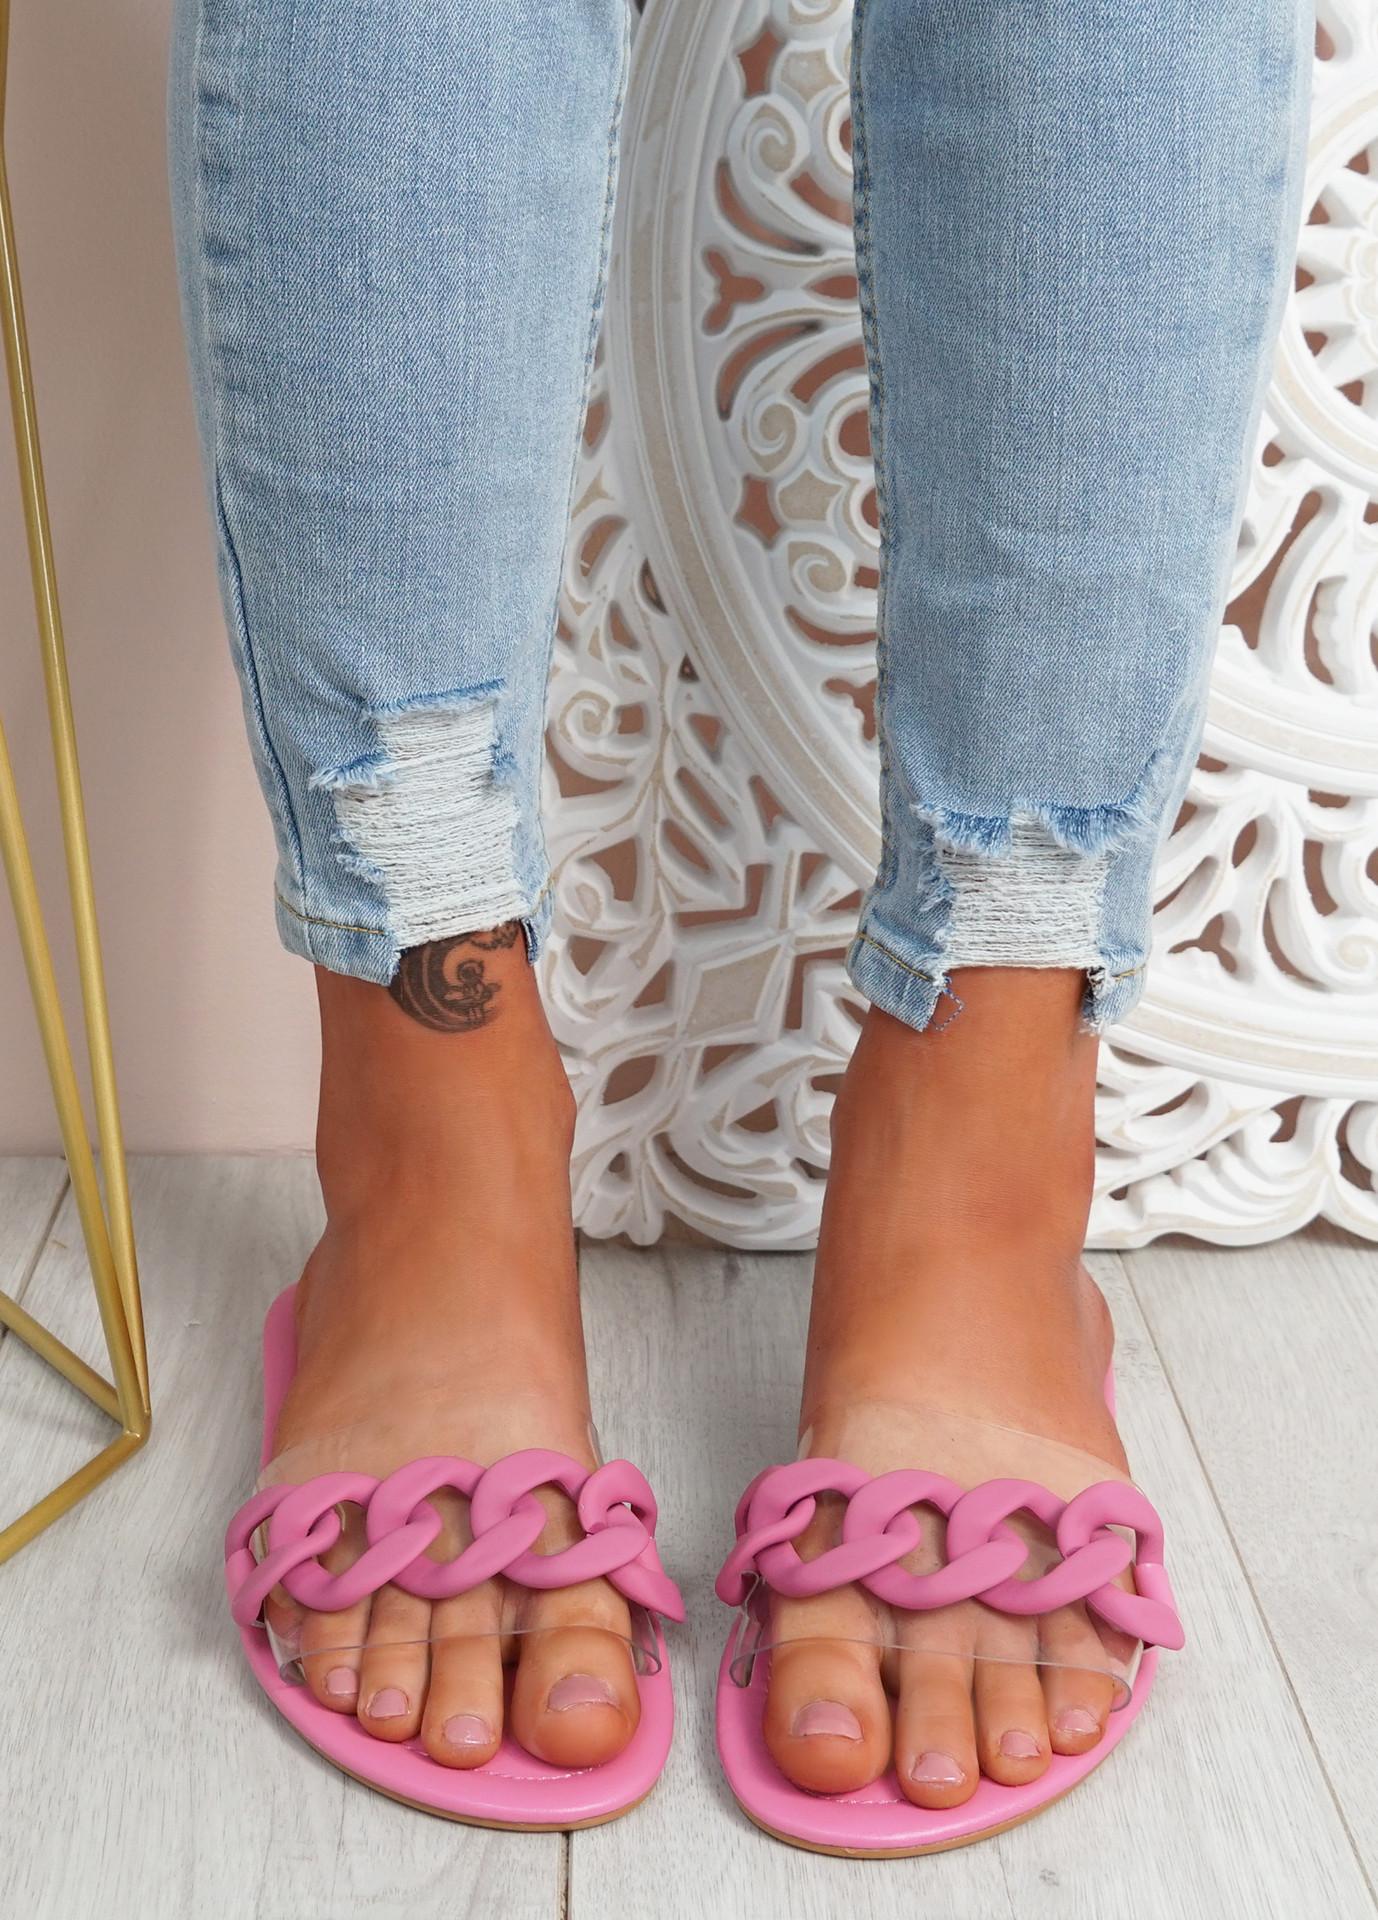 Vemma Fuchsia Slip On Flat Sandals